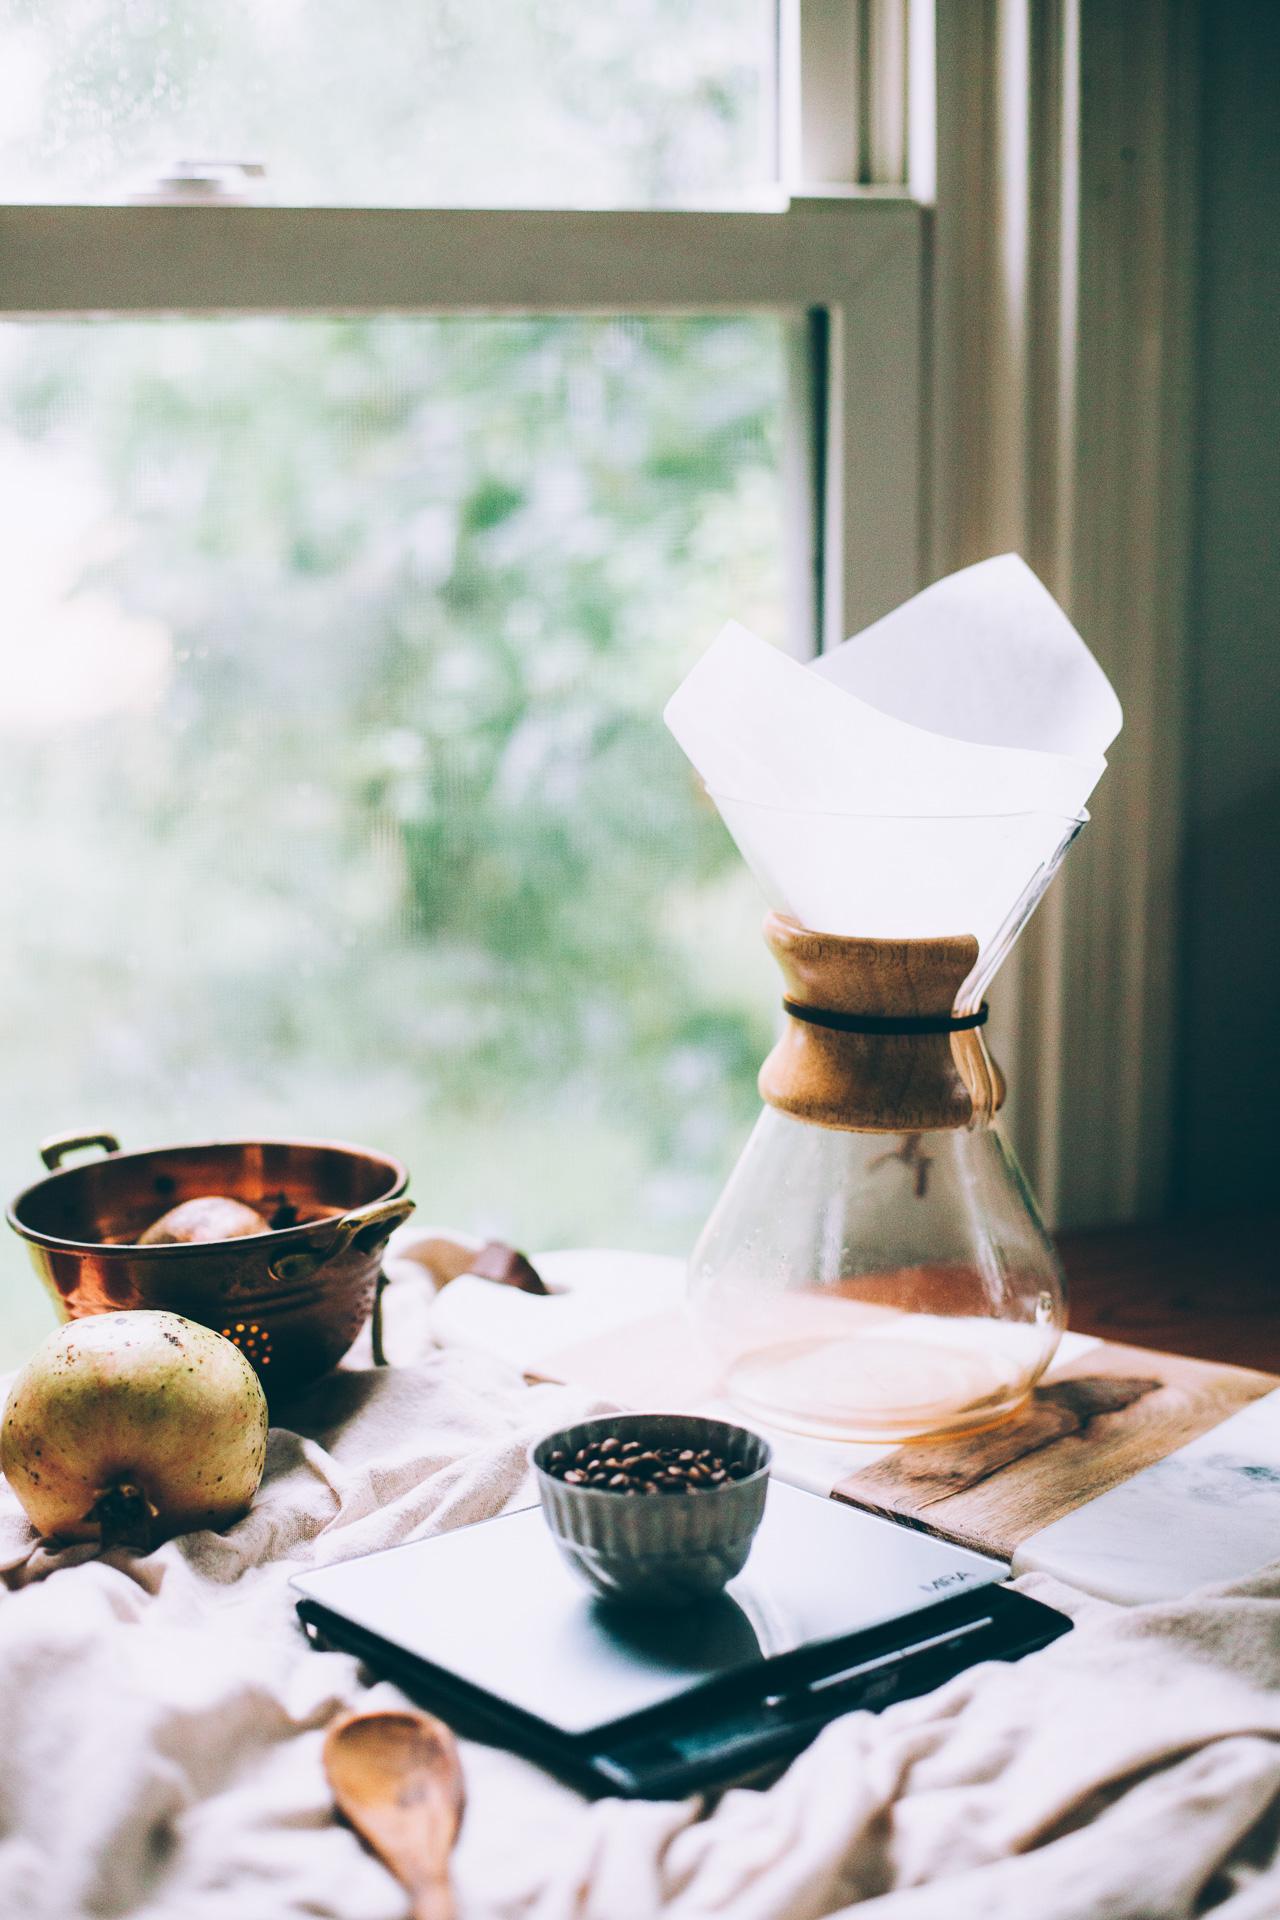 How to Brew Chemex Coffee Like a Pro | method via willfrolicforfood.com